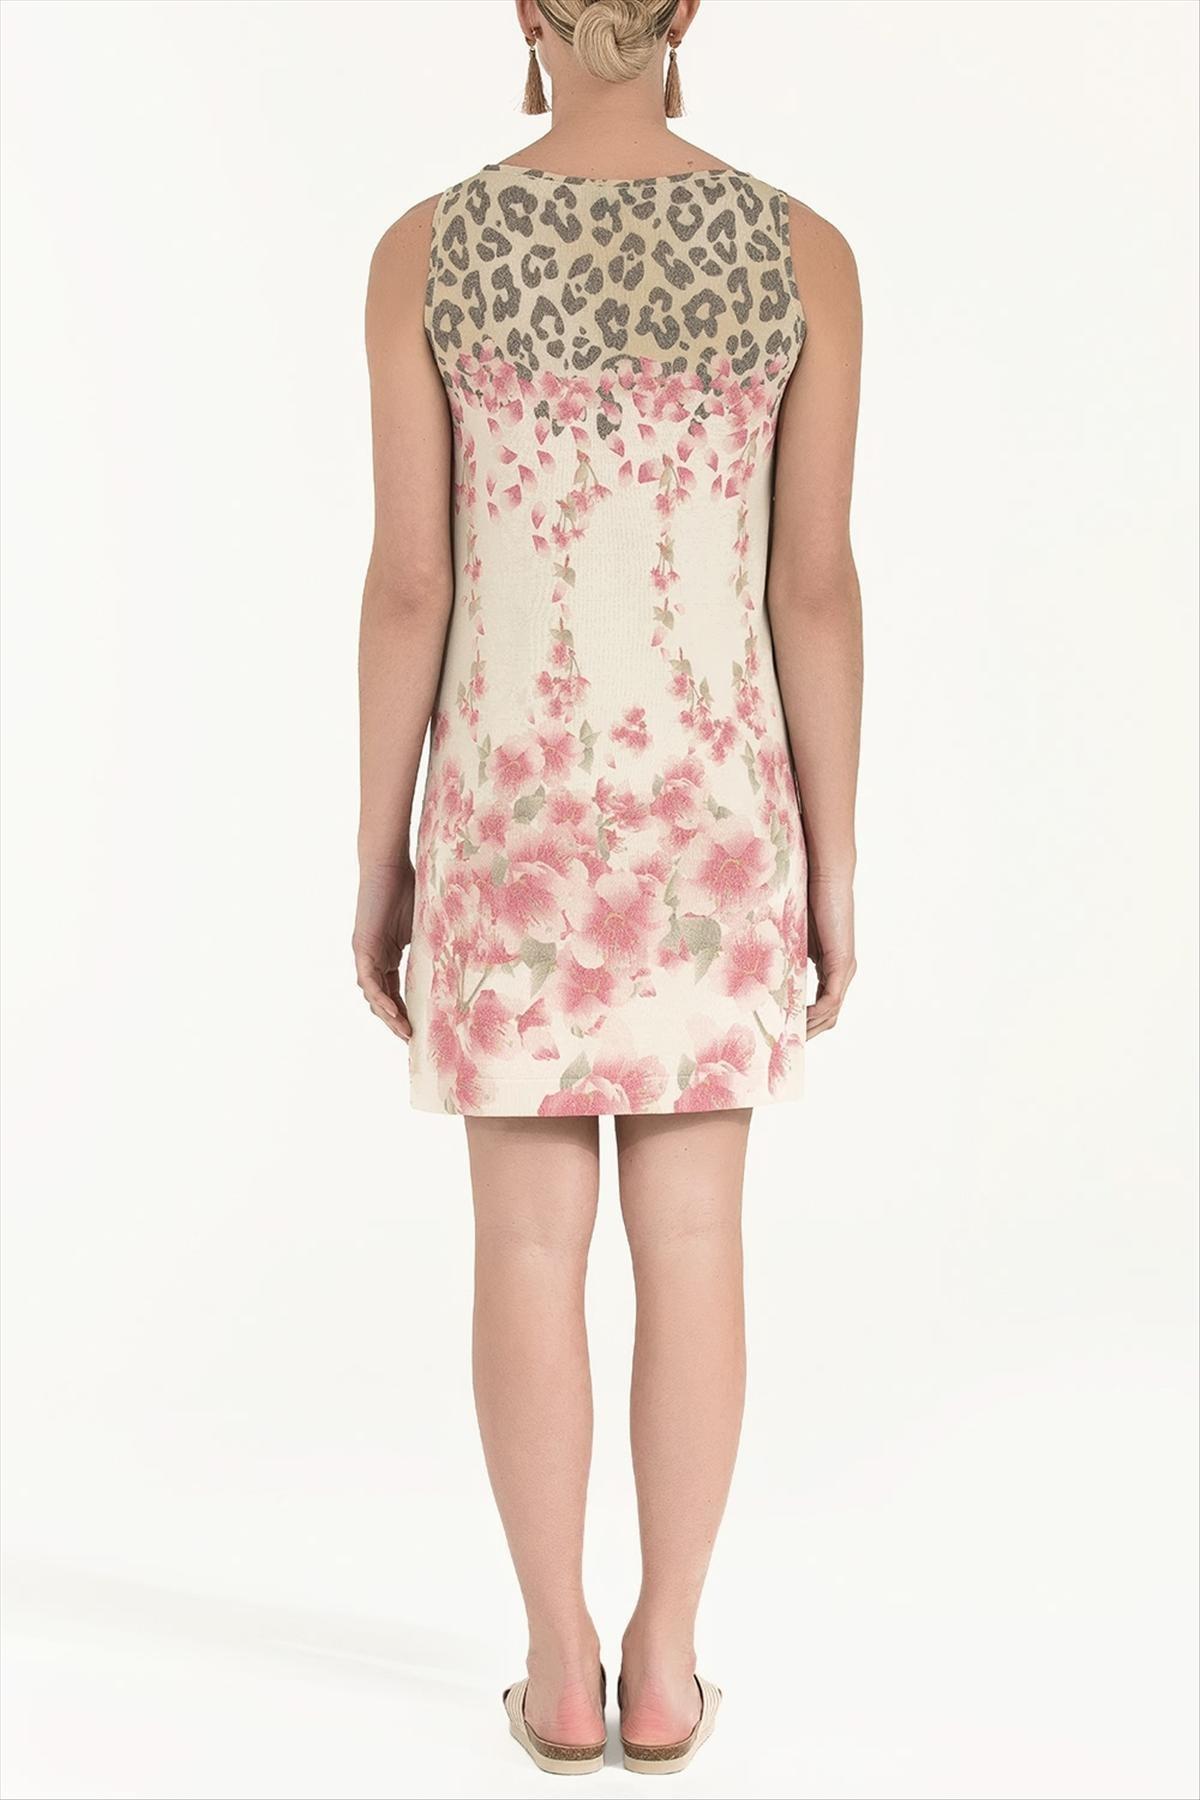 Societa Kadın Desenli Triko Elbise Taş 28470